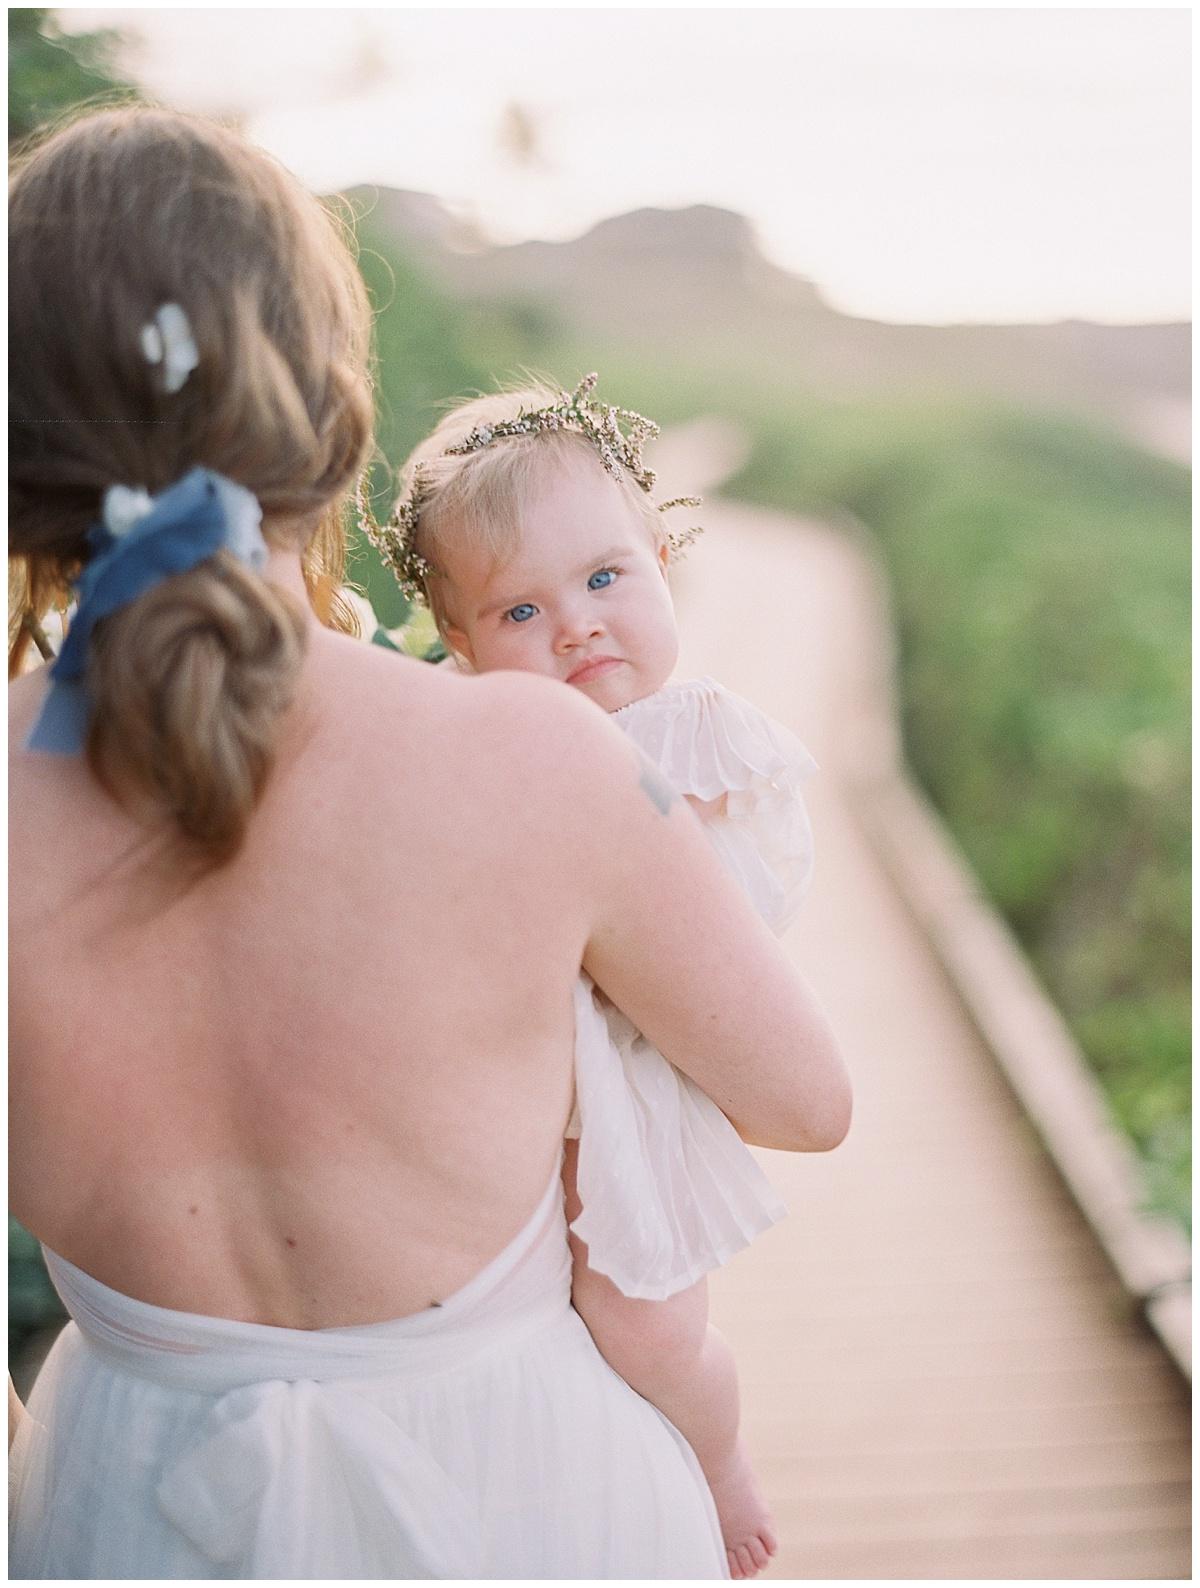 beach-elopement-bride-baby-girl-boardwalk.jpg